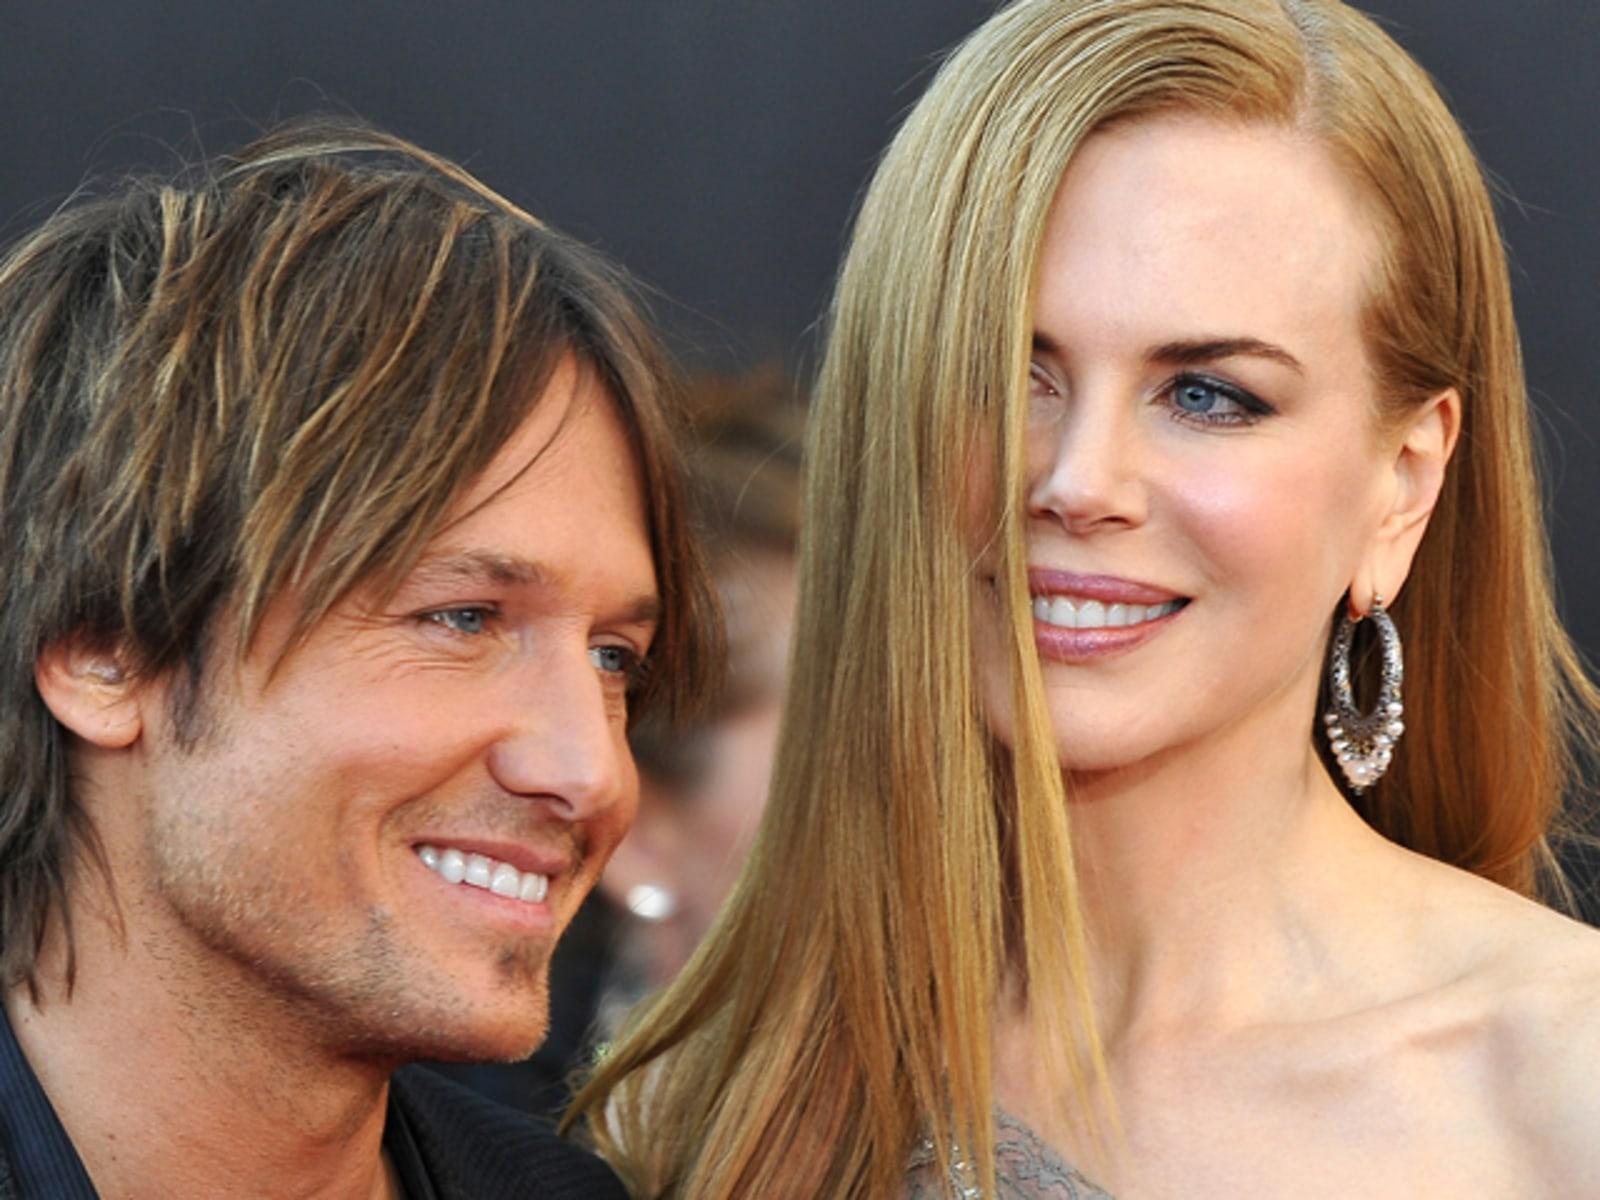 Image: Actress Nicole Kidman and husband Keith